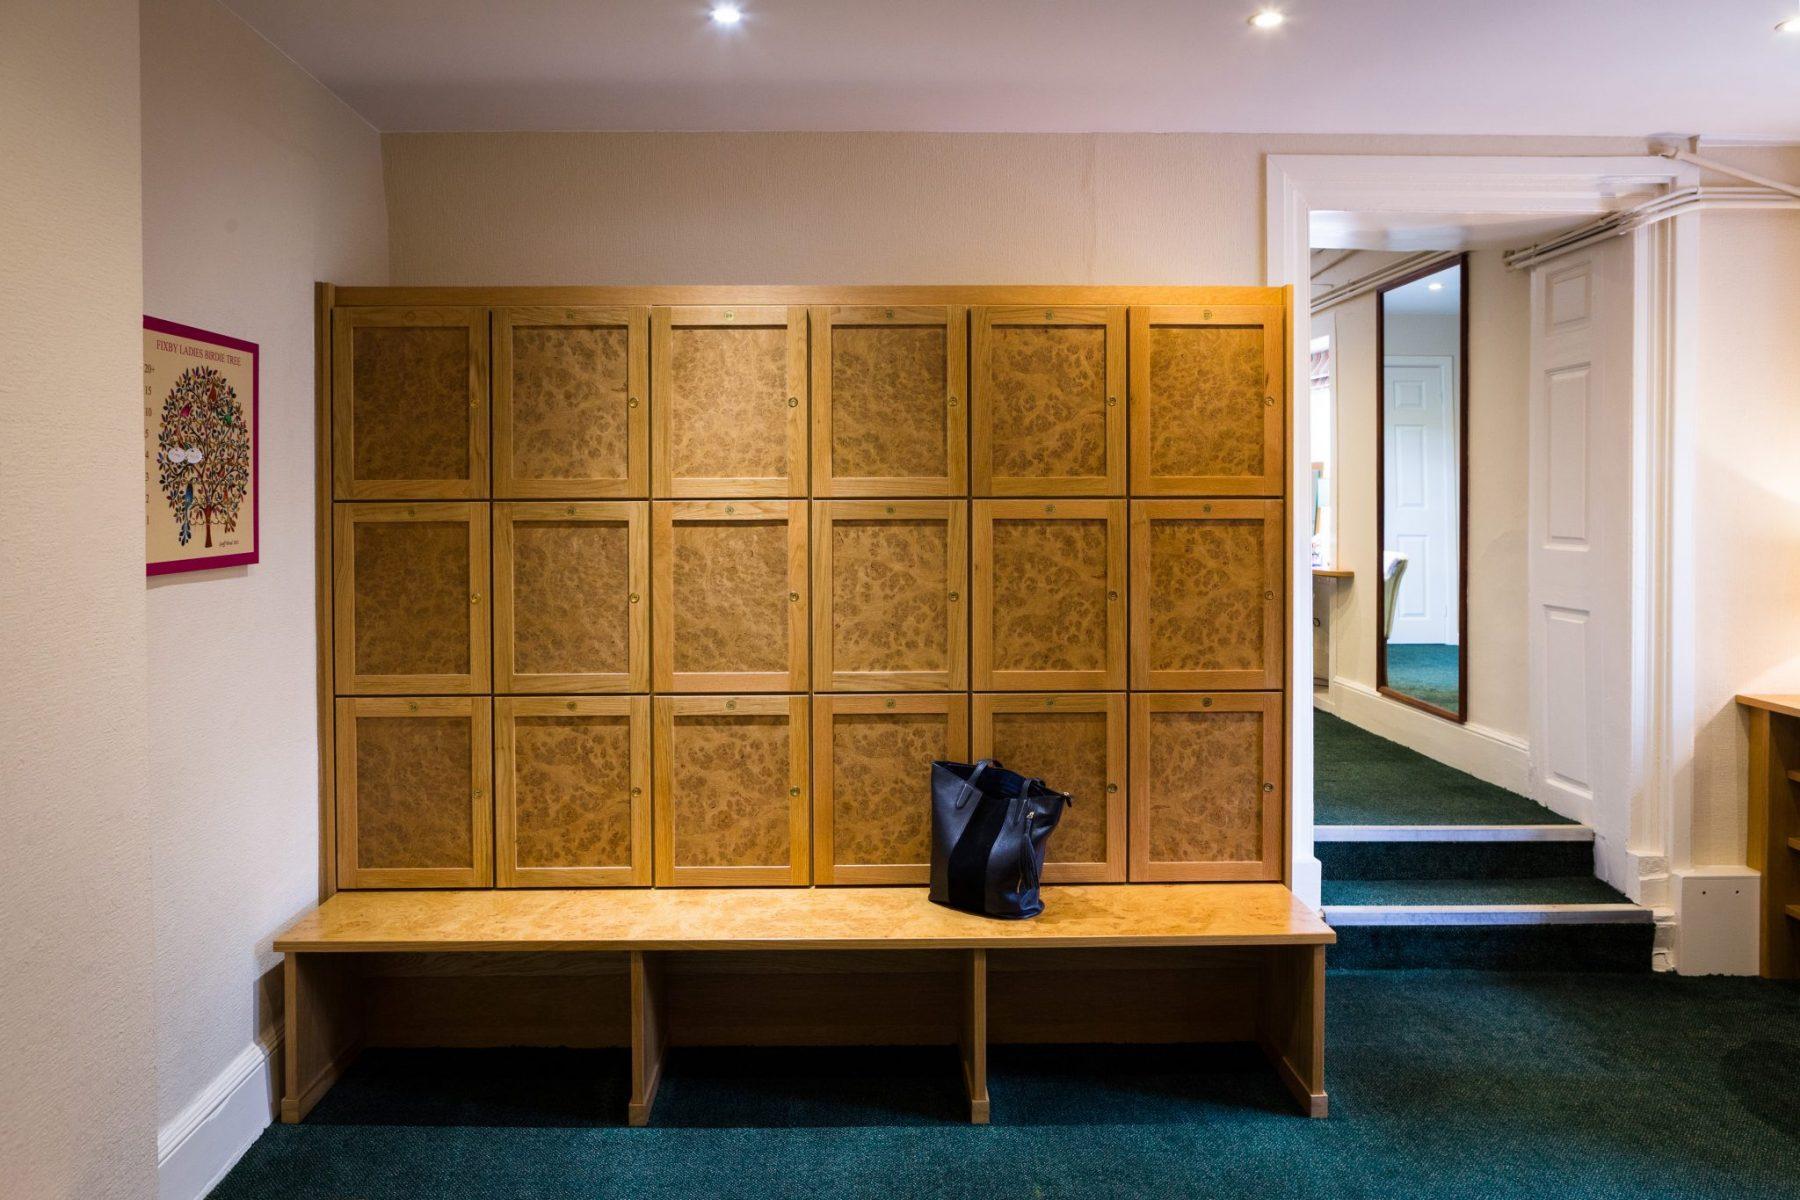 Huddersfield Gold Club Ladies Locker Room